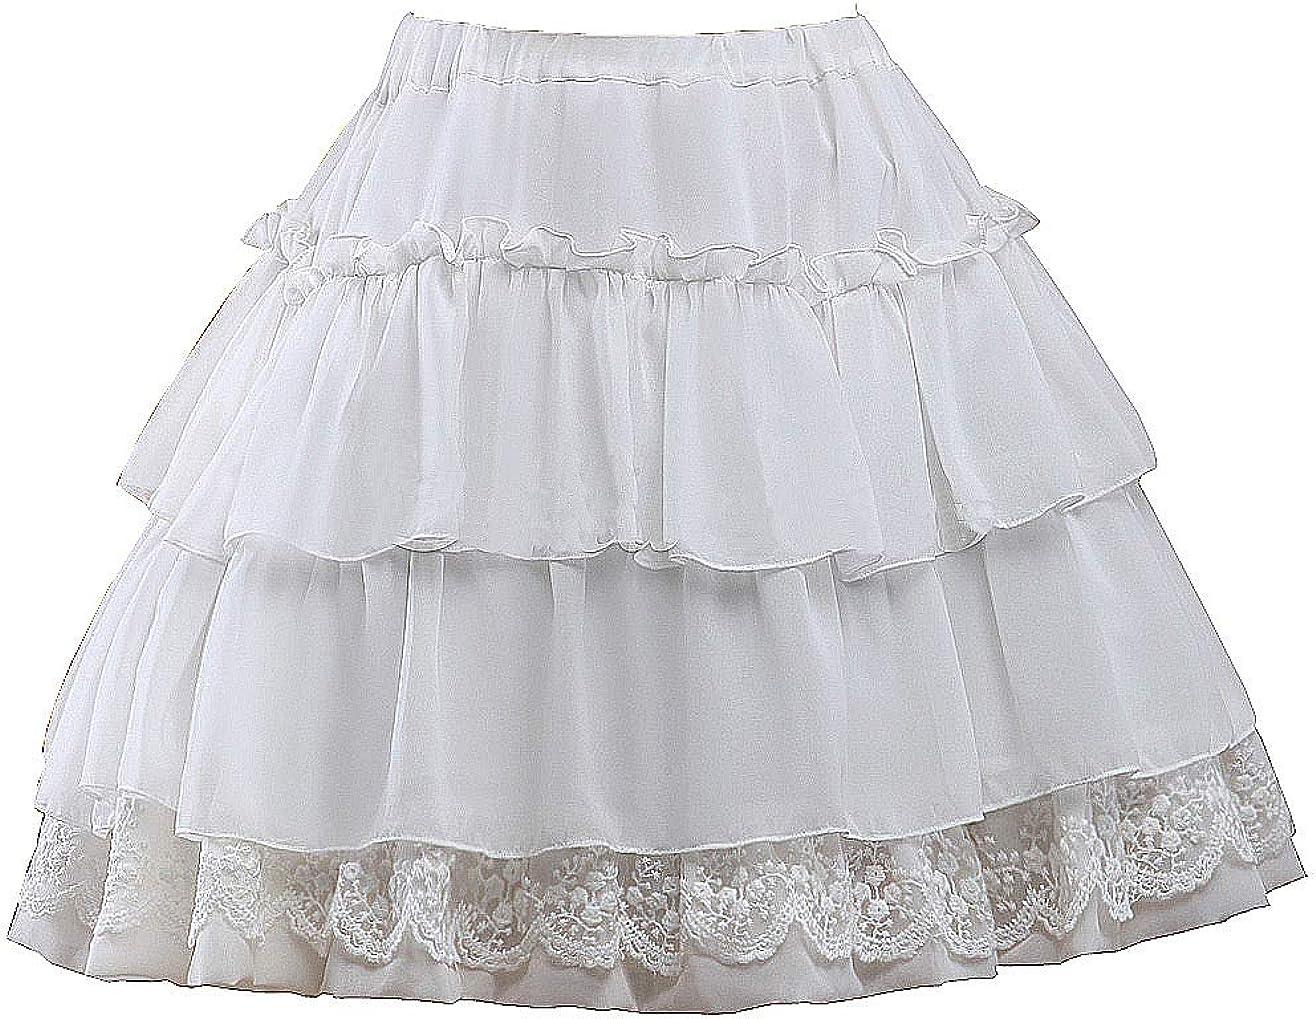 Antaina White Cotton Victorian Floral Lace Ruffled Layered Lolita Tutu Skirt